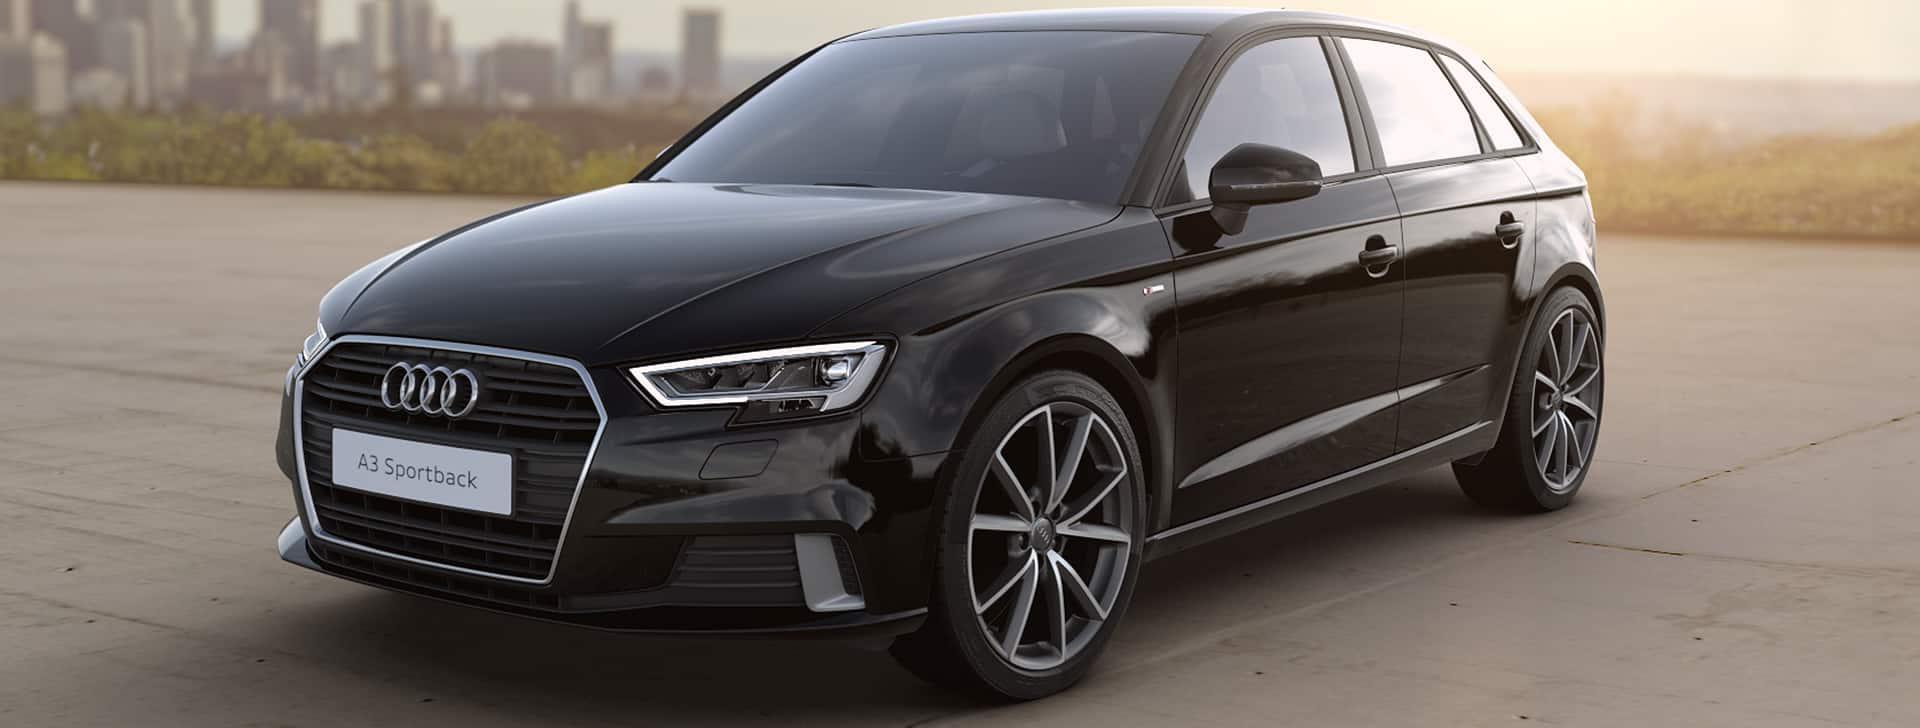 Audi etron  Audi UK